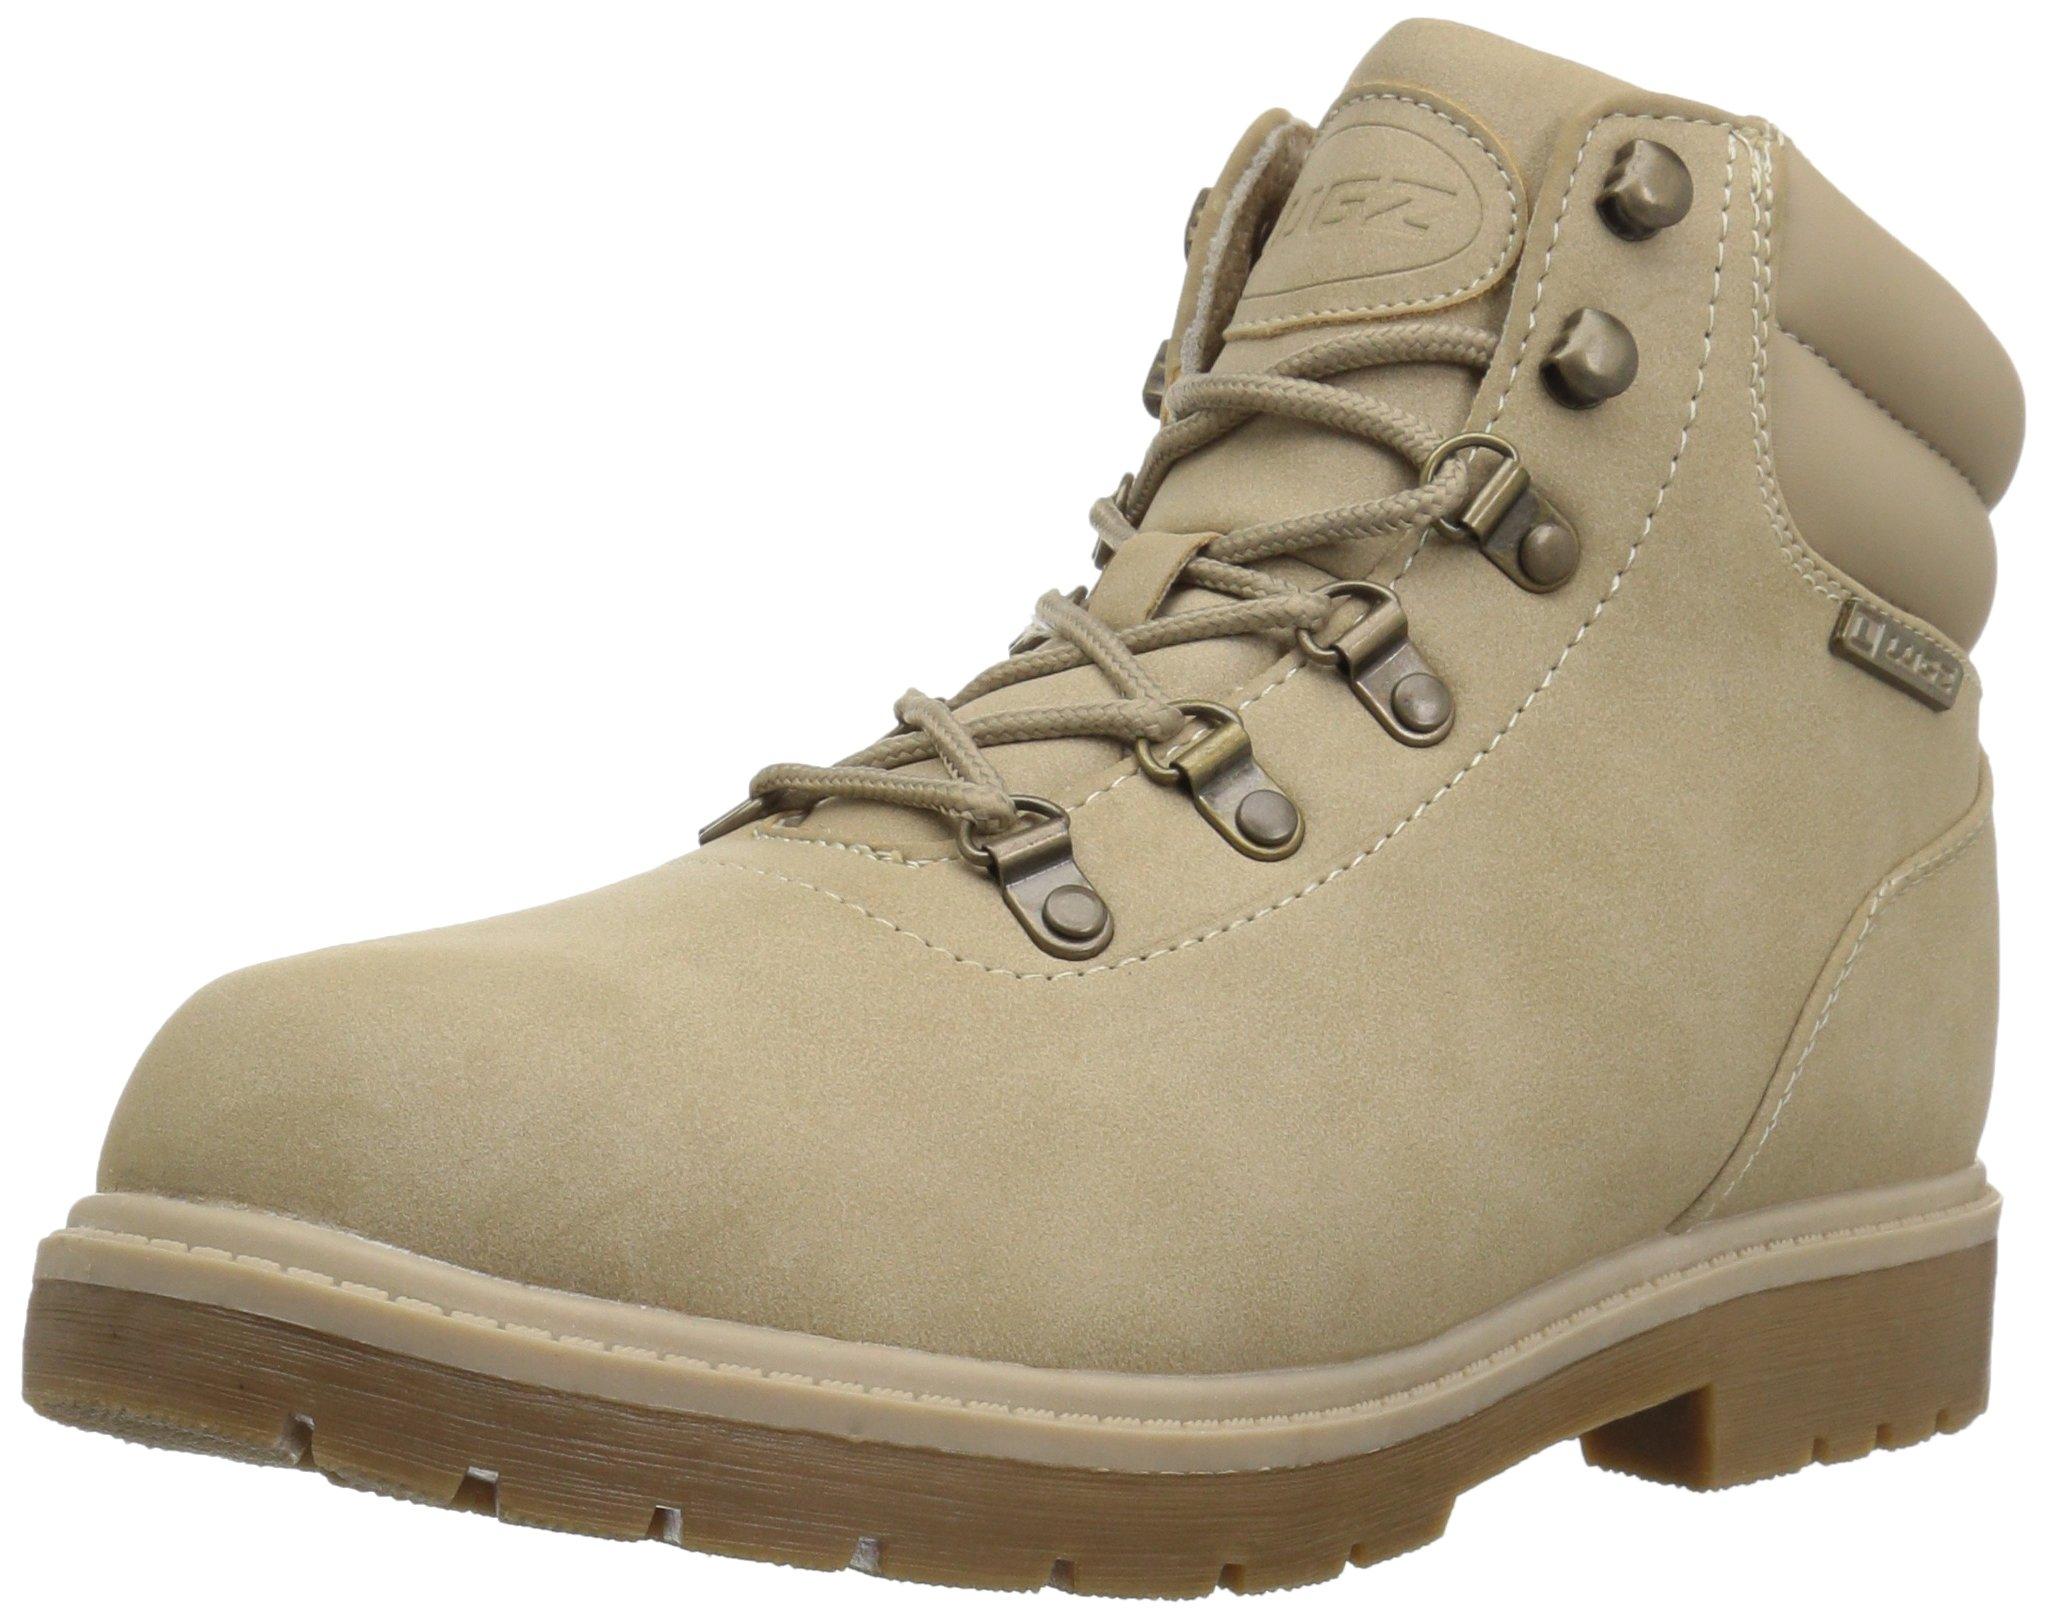 Lugz Men's Briarwood Mid Fashion Boot, Sand/Gum, 10.5 D US